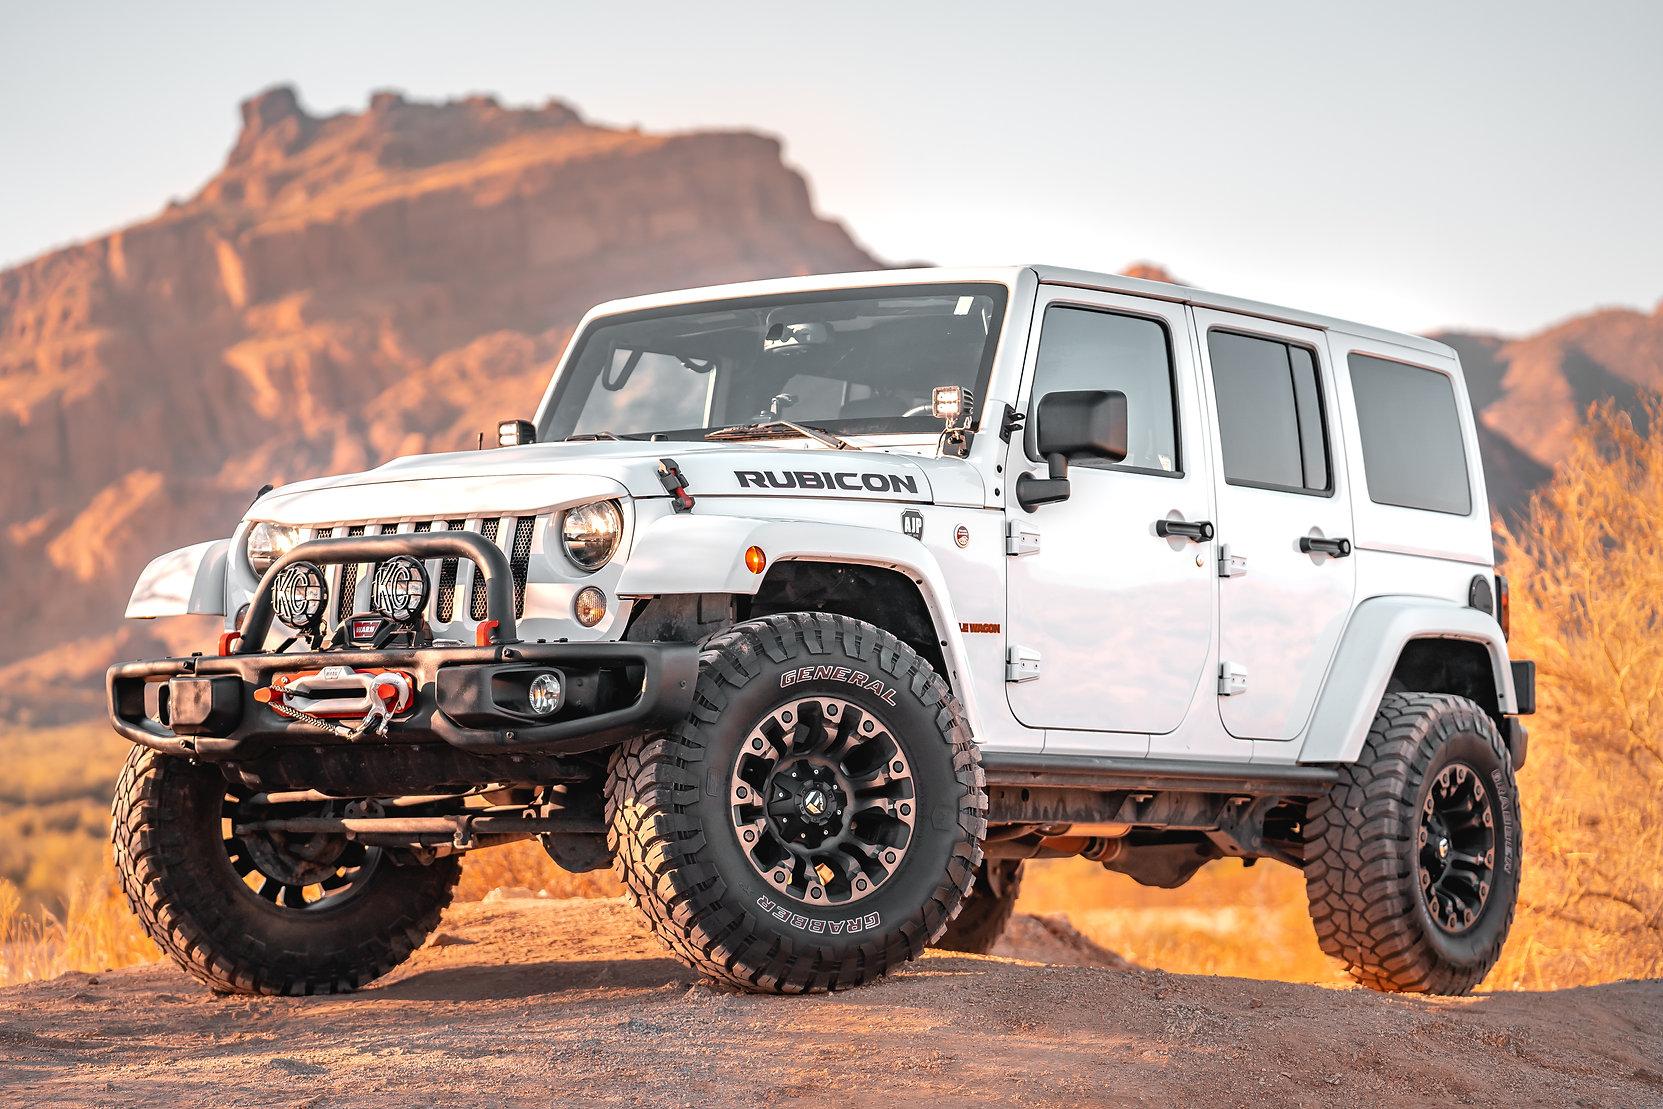 Jeep Rubicon HD_001.jpg